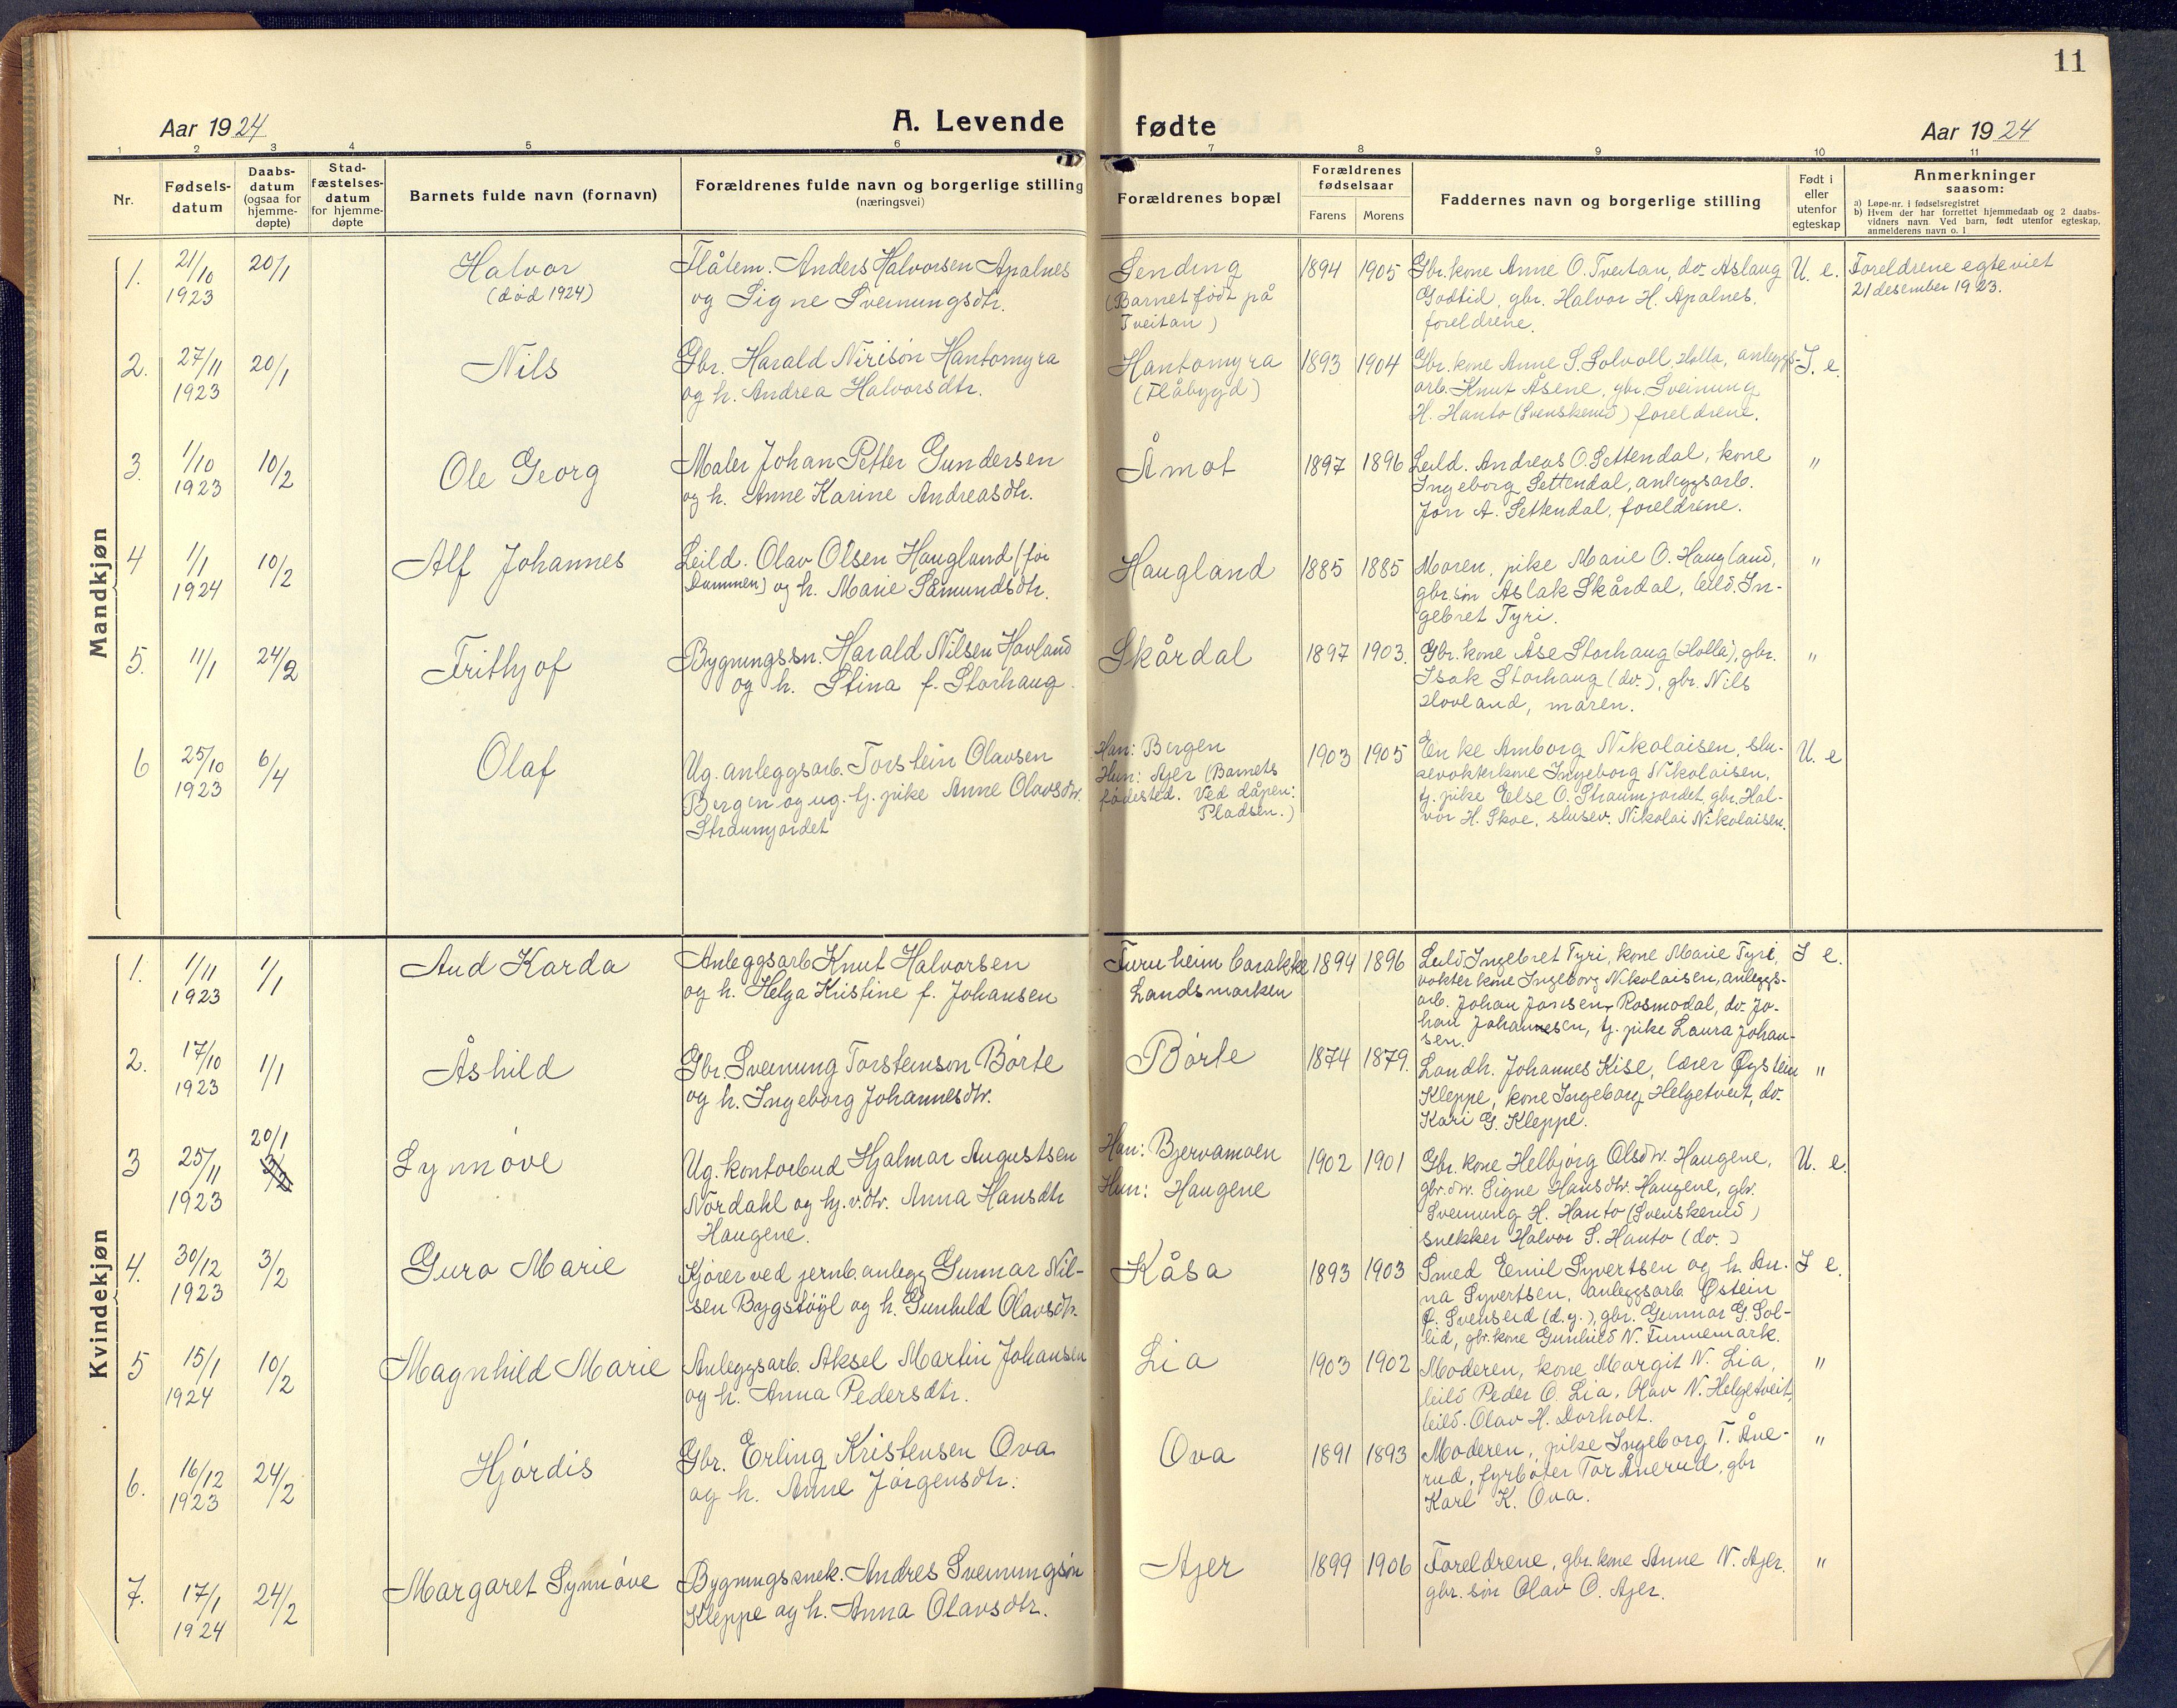 SAKO, Lunde kirkebøker, F/Fa/L0006: Ministerialbok nr. I 6, 1922-1940, s. 11